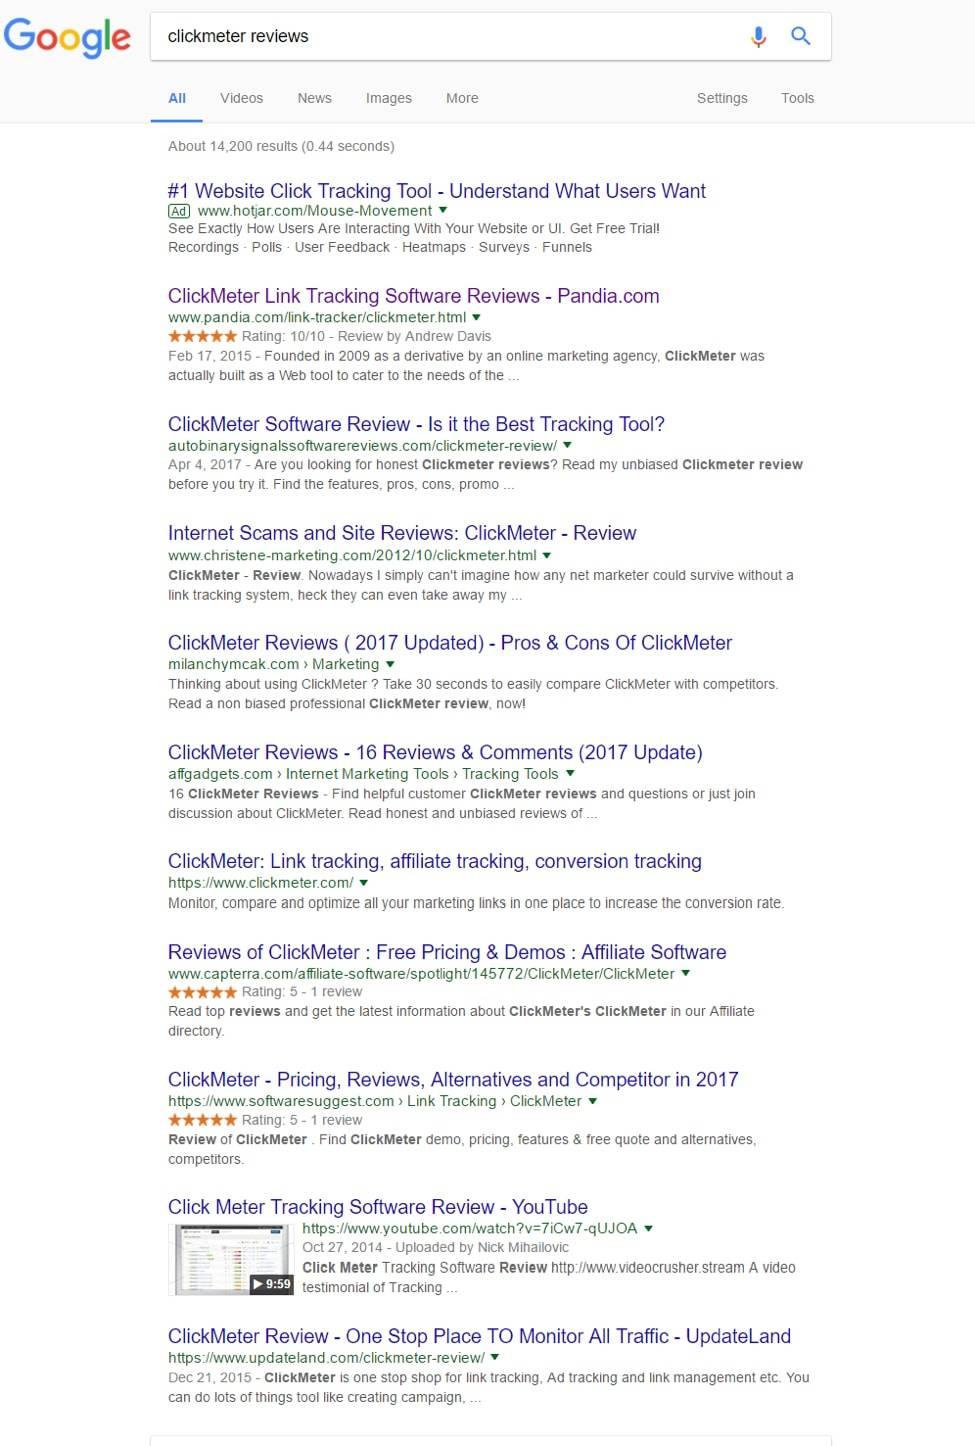 Clickmeter Reviews SERPs